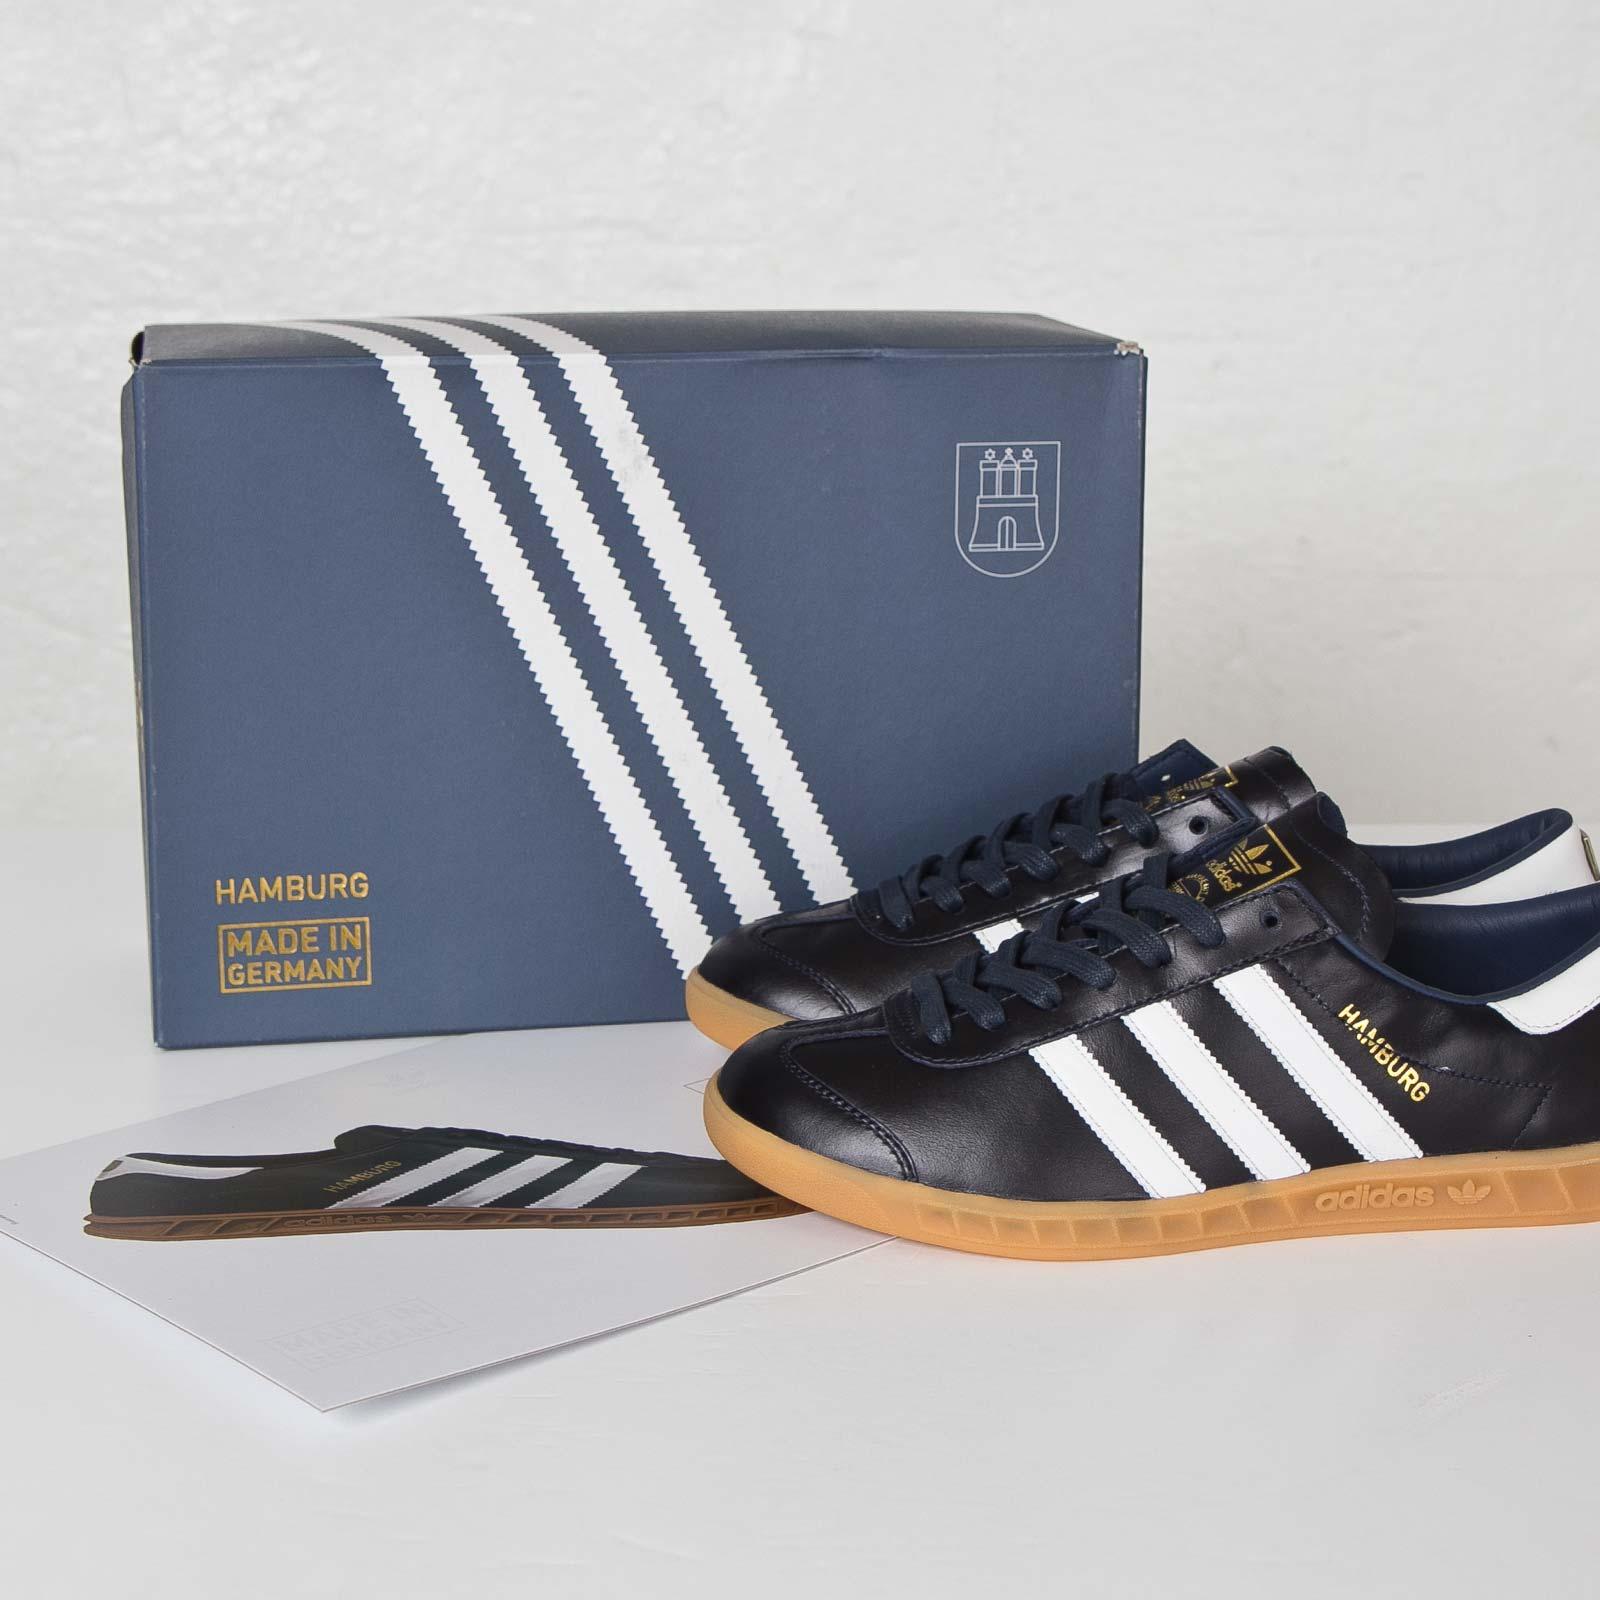 purchase cheap 4ece8 b69dc ... adidas Hamburg Made In Germany